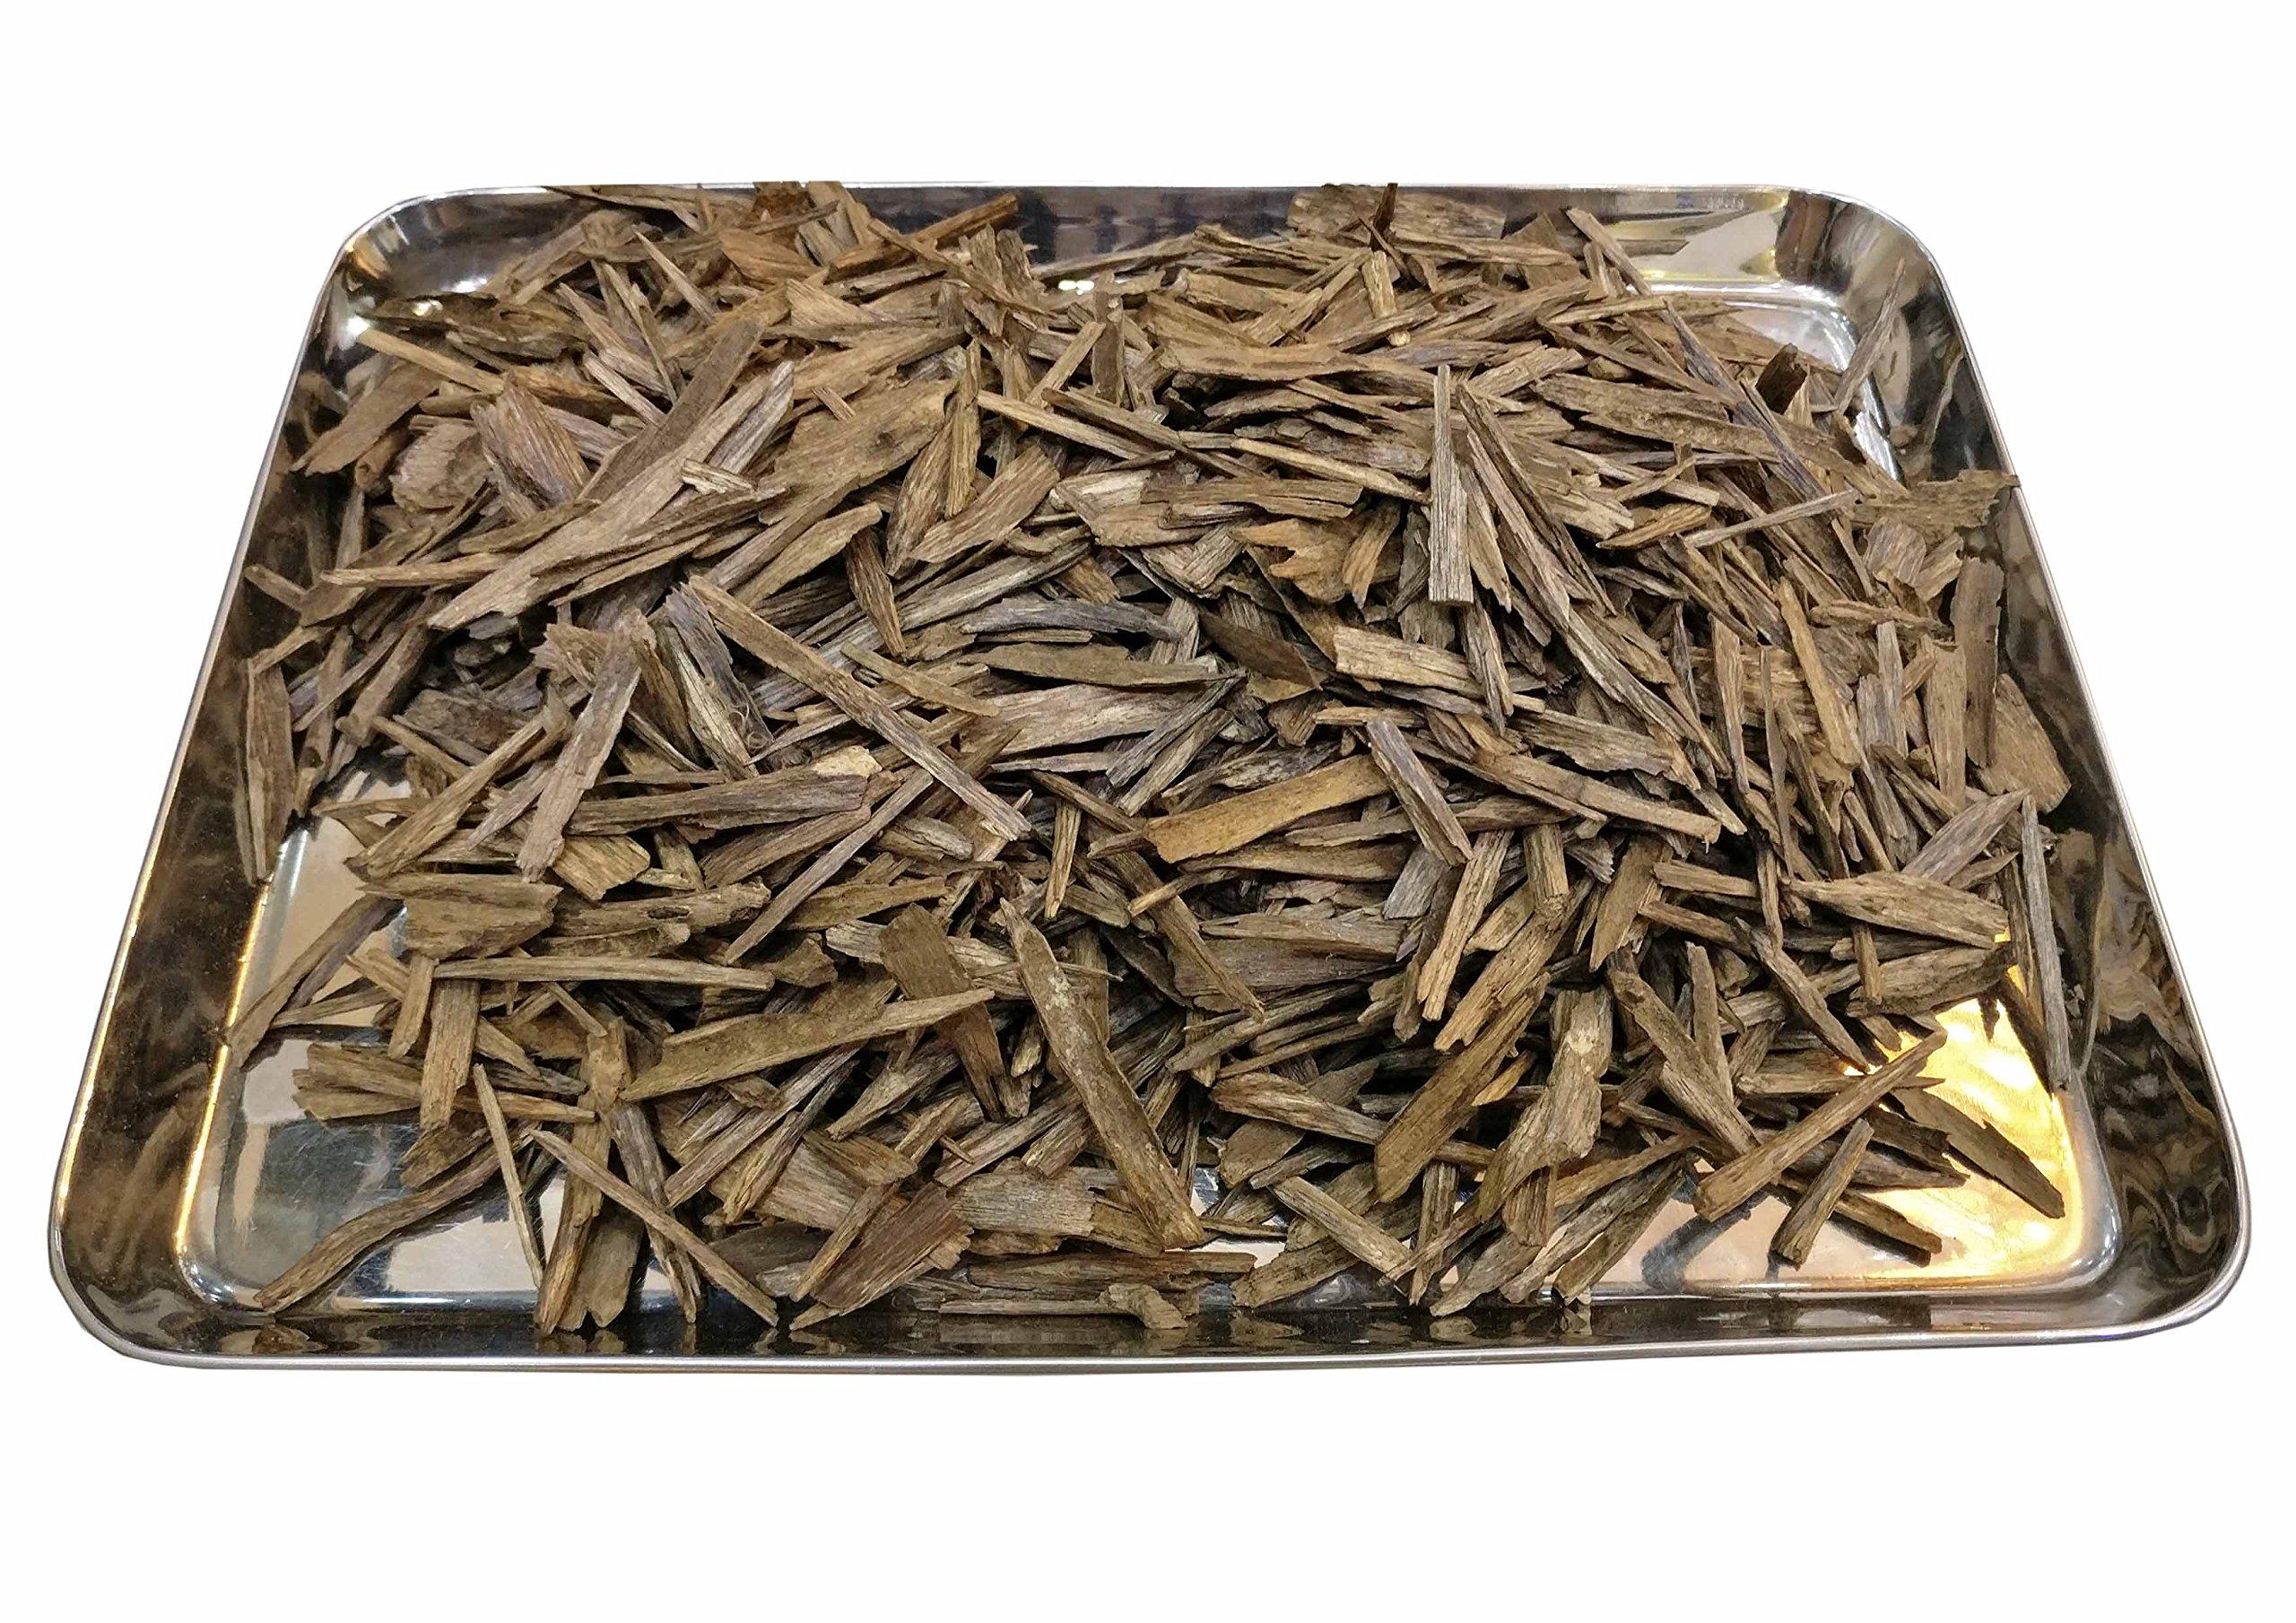 Oudh / Agarwood / 沉香/Gaharu 25gms Aged Wild Harvested Finest Quality GRADE:A by Siba